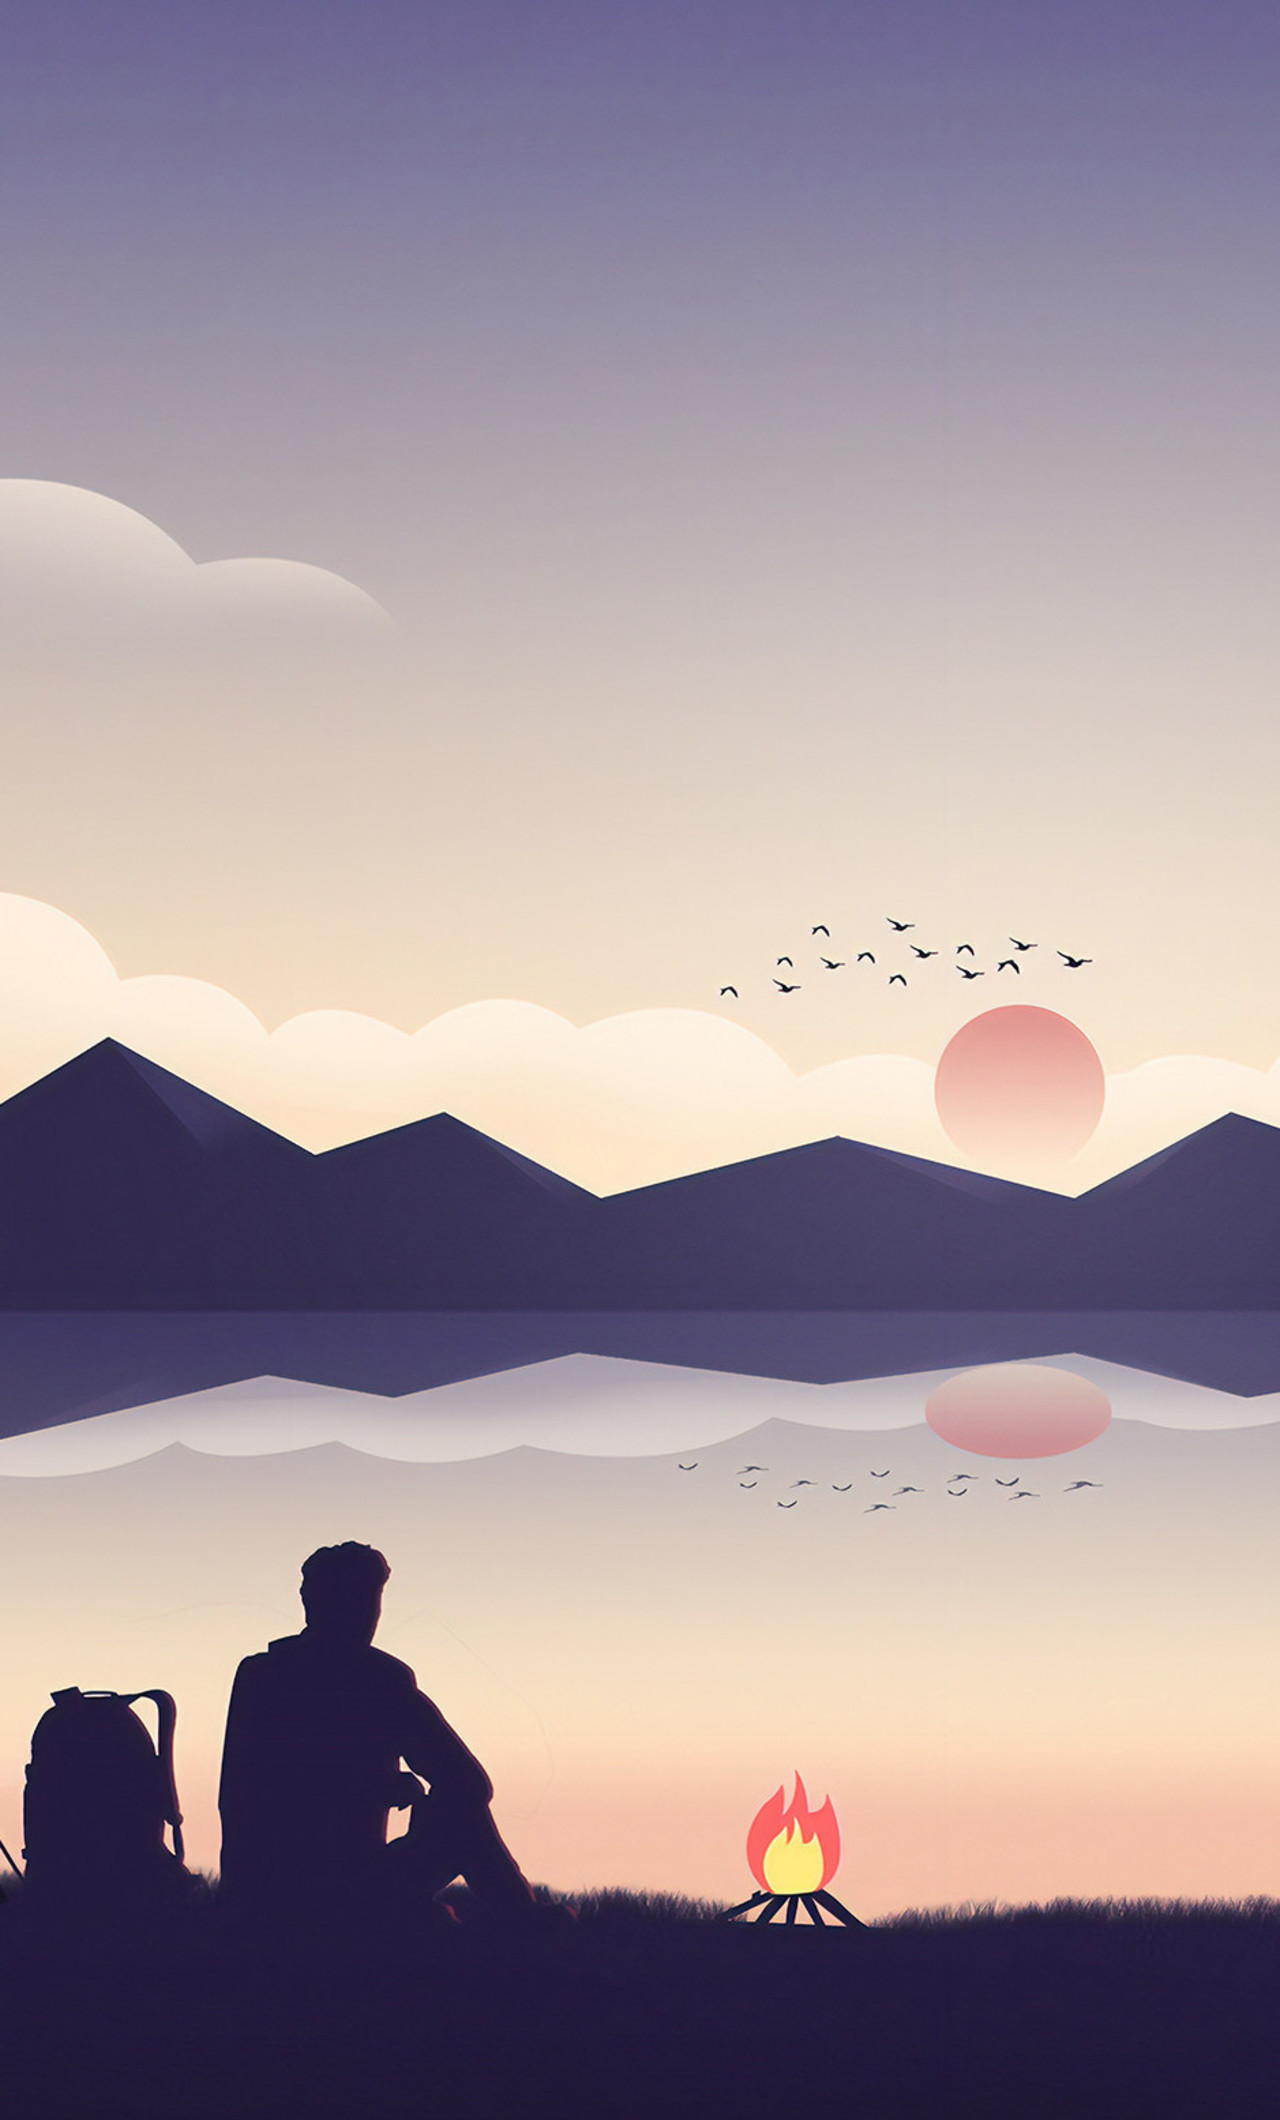 Alone Sad Wallpaper 4k 3013664 Hd Wallpaper Backgrounds Download